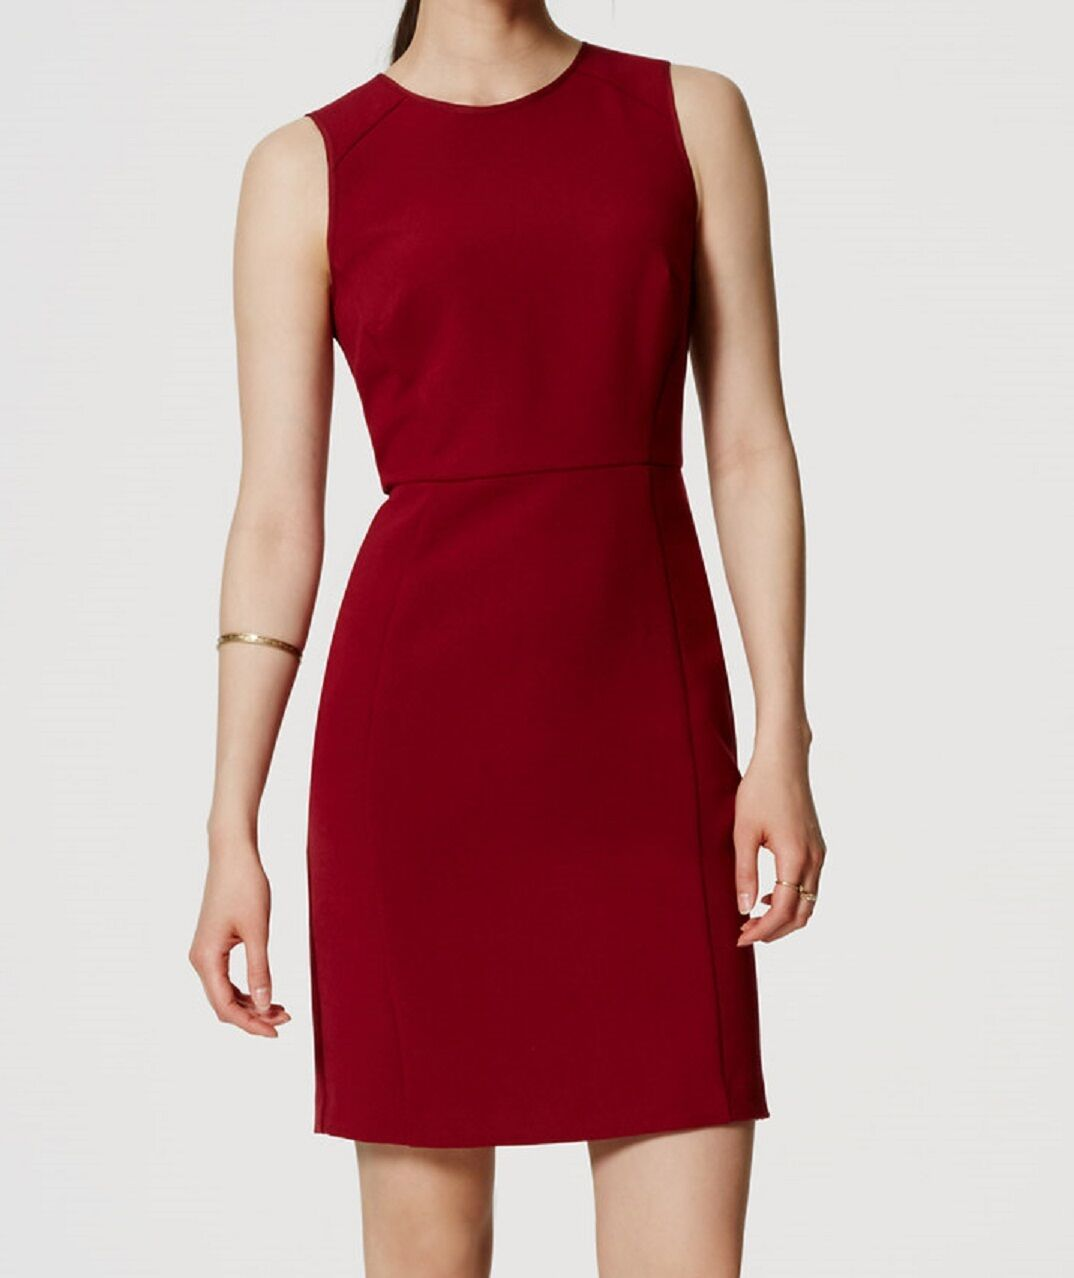 NWT Ann Taylor LOFT Paneled Sleeveless Sheath Dress Größe 2